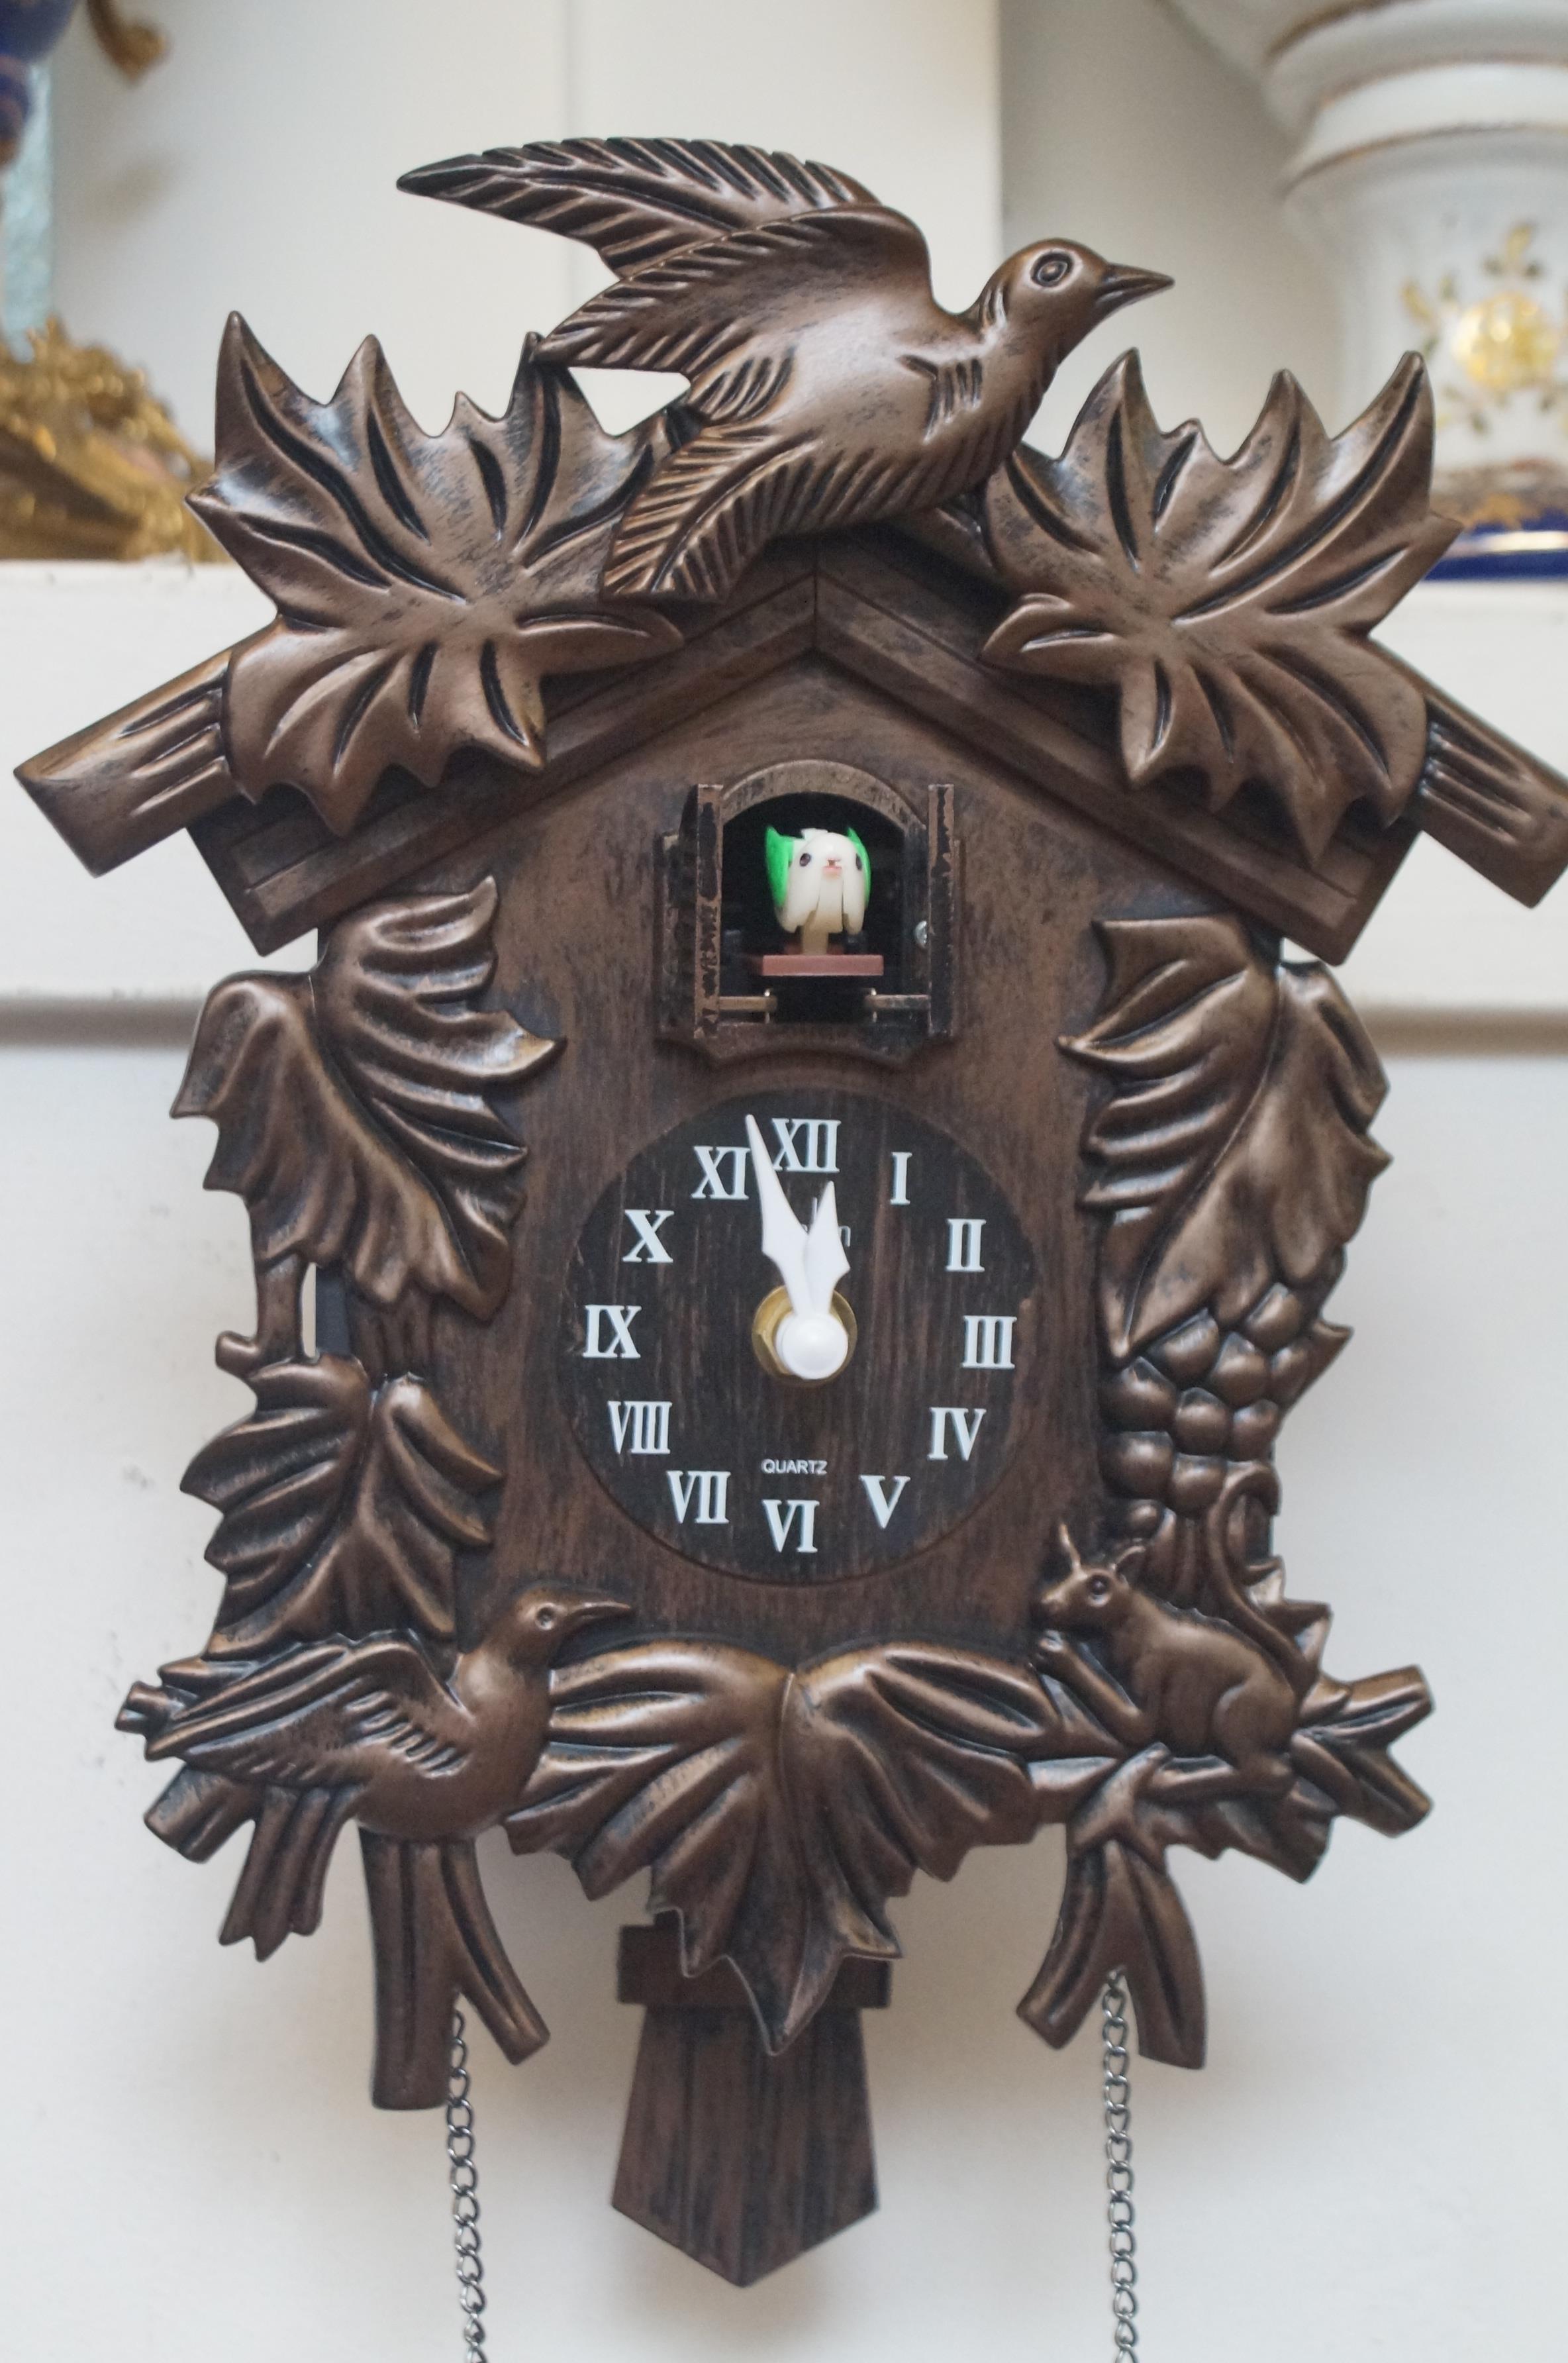 Cuckoo clock (Plastic) with weights & pendulum